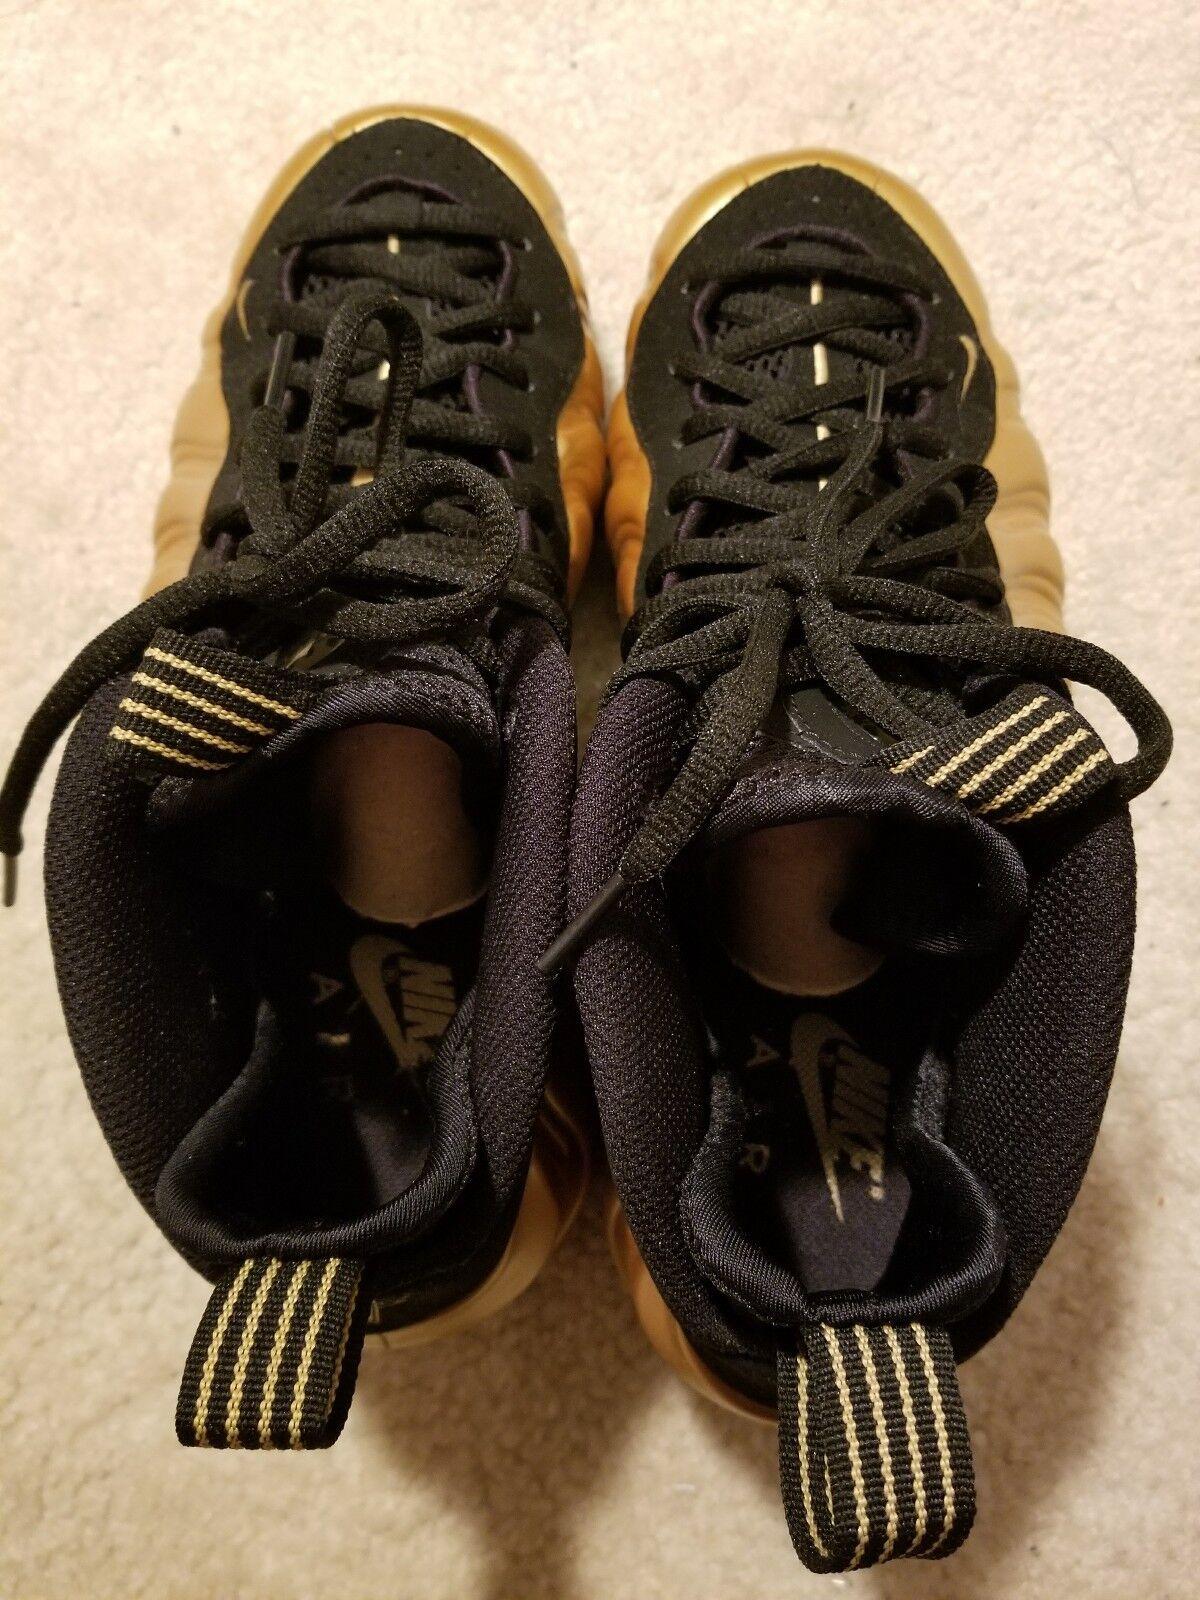 Men's Nike Air Foamposite One Metallic gold 314996 700BB Sz 8.5 Near Mint Con.